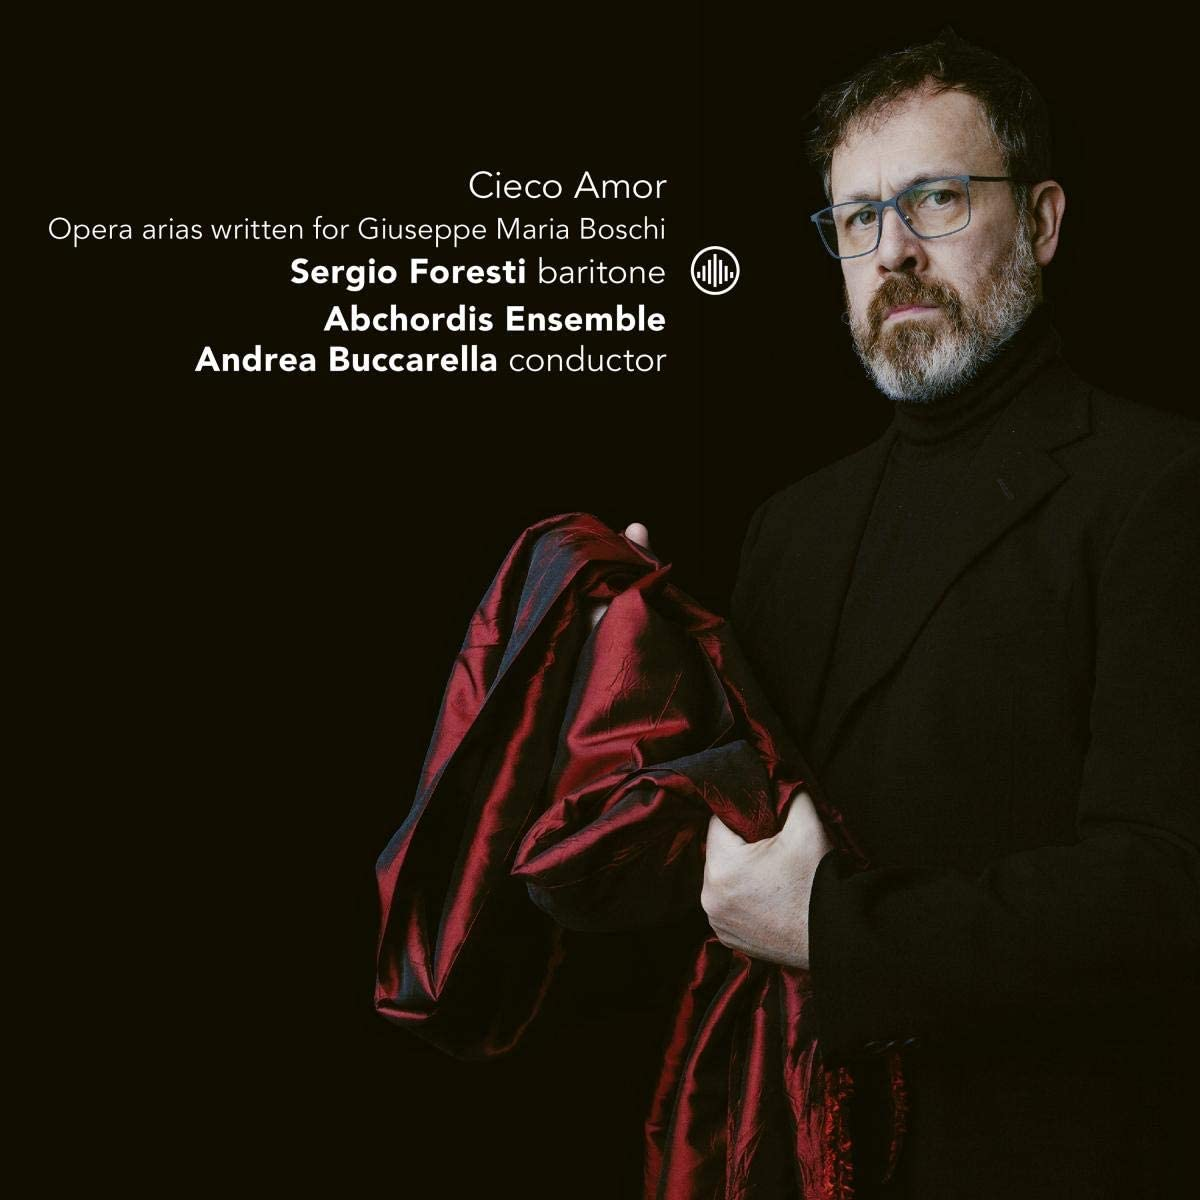 Review of Cieco Amor: Opera arias written for Giuseppe Maria Boschi (Sergio Foresti)